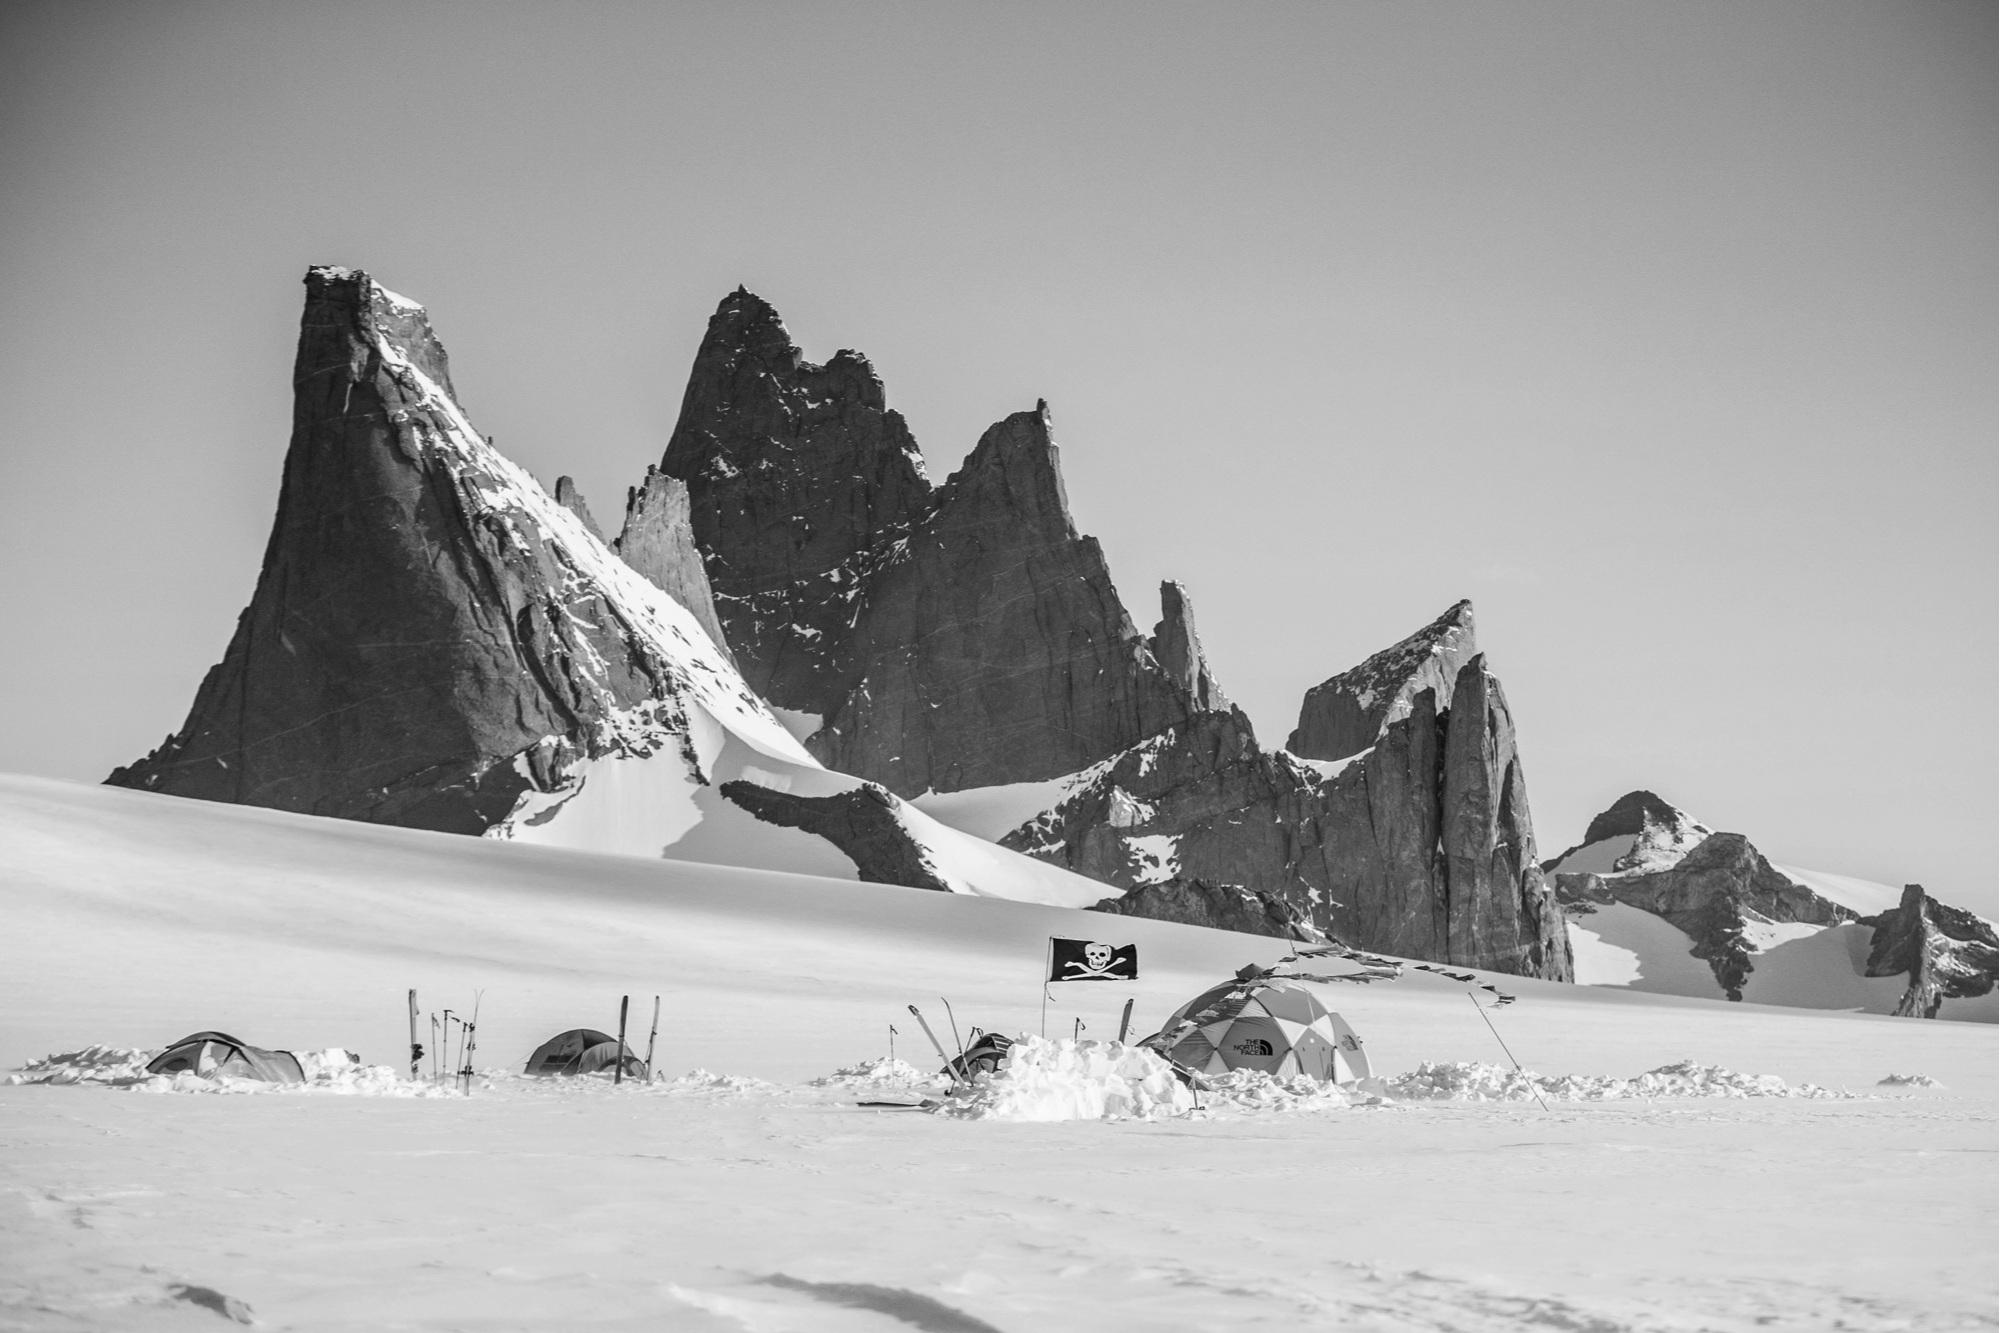 the-north-face-expedition-antarctica-base-camp-durana.jpg